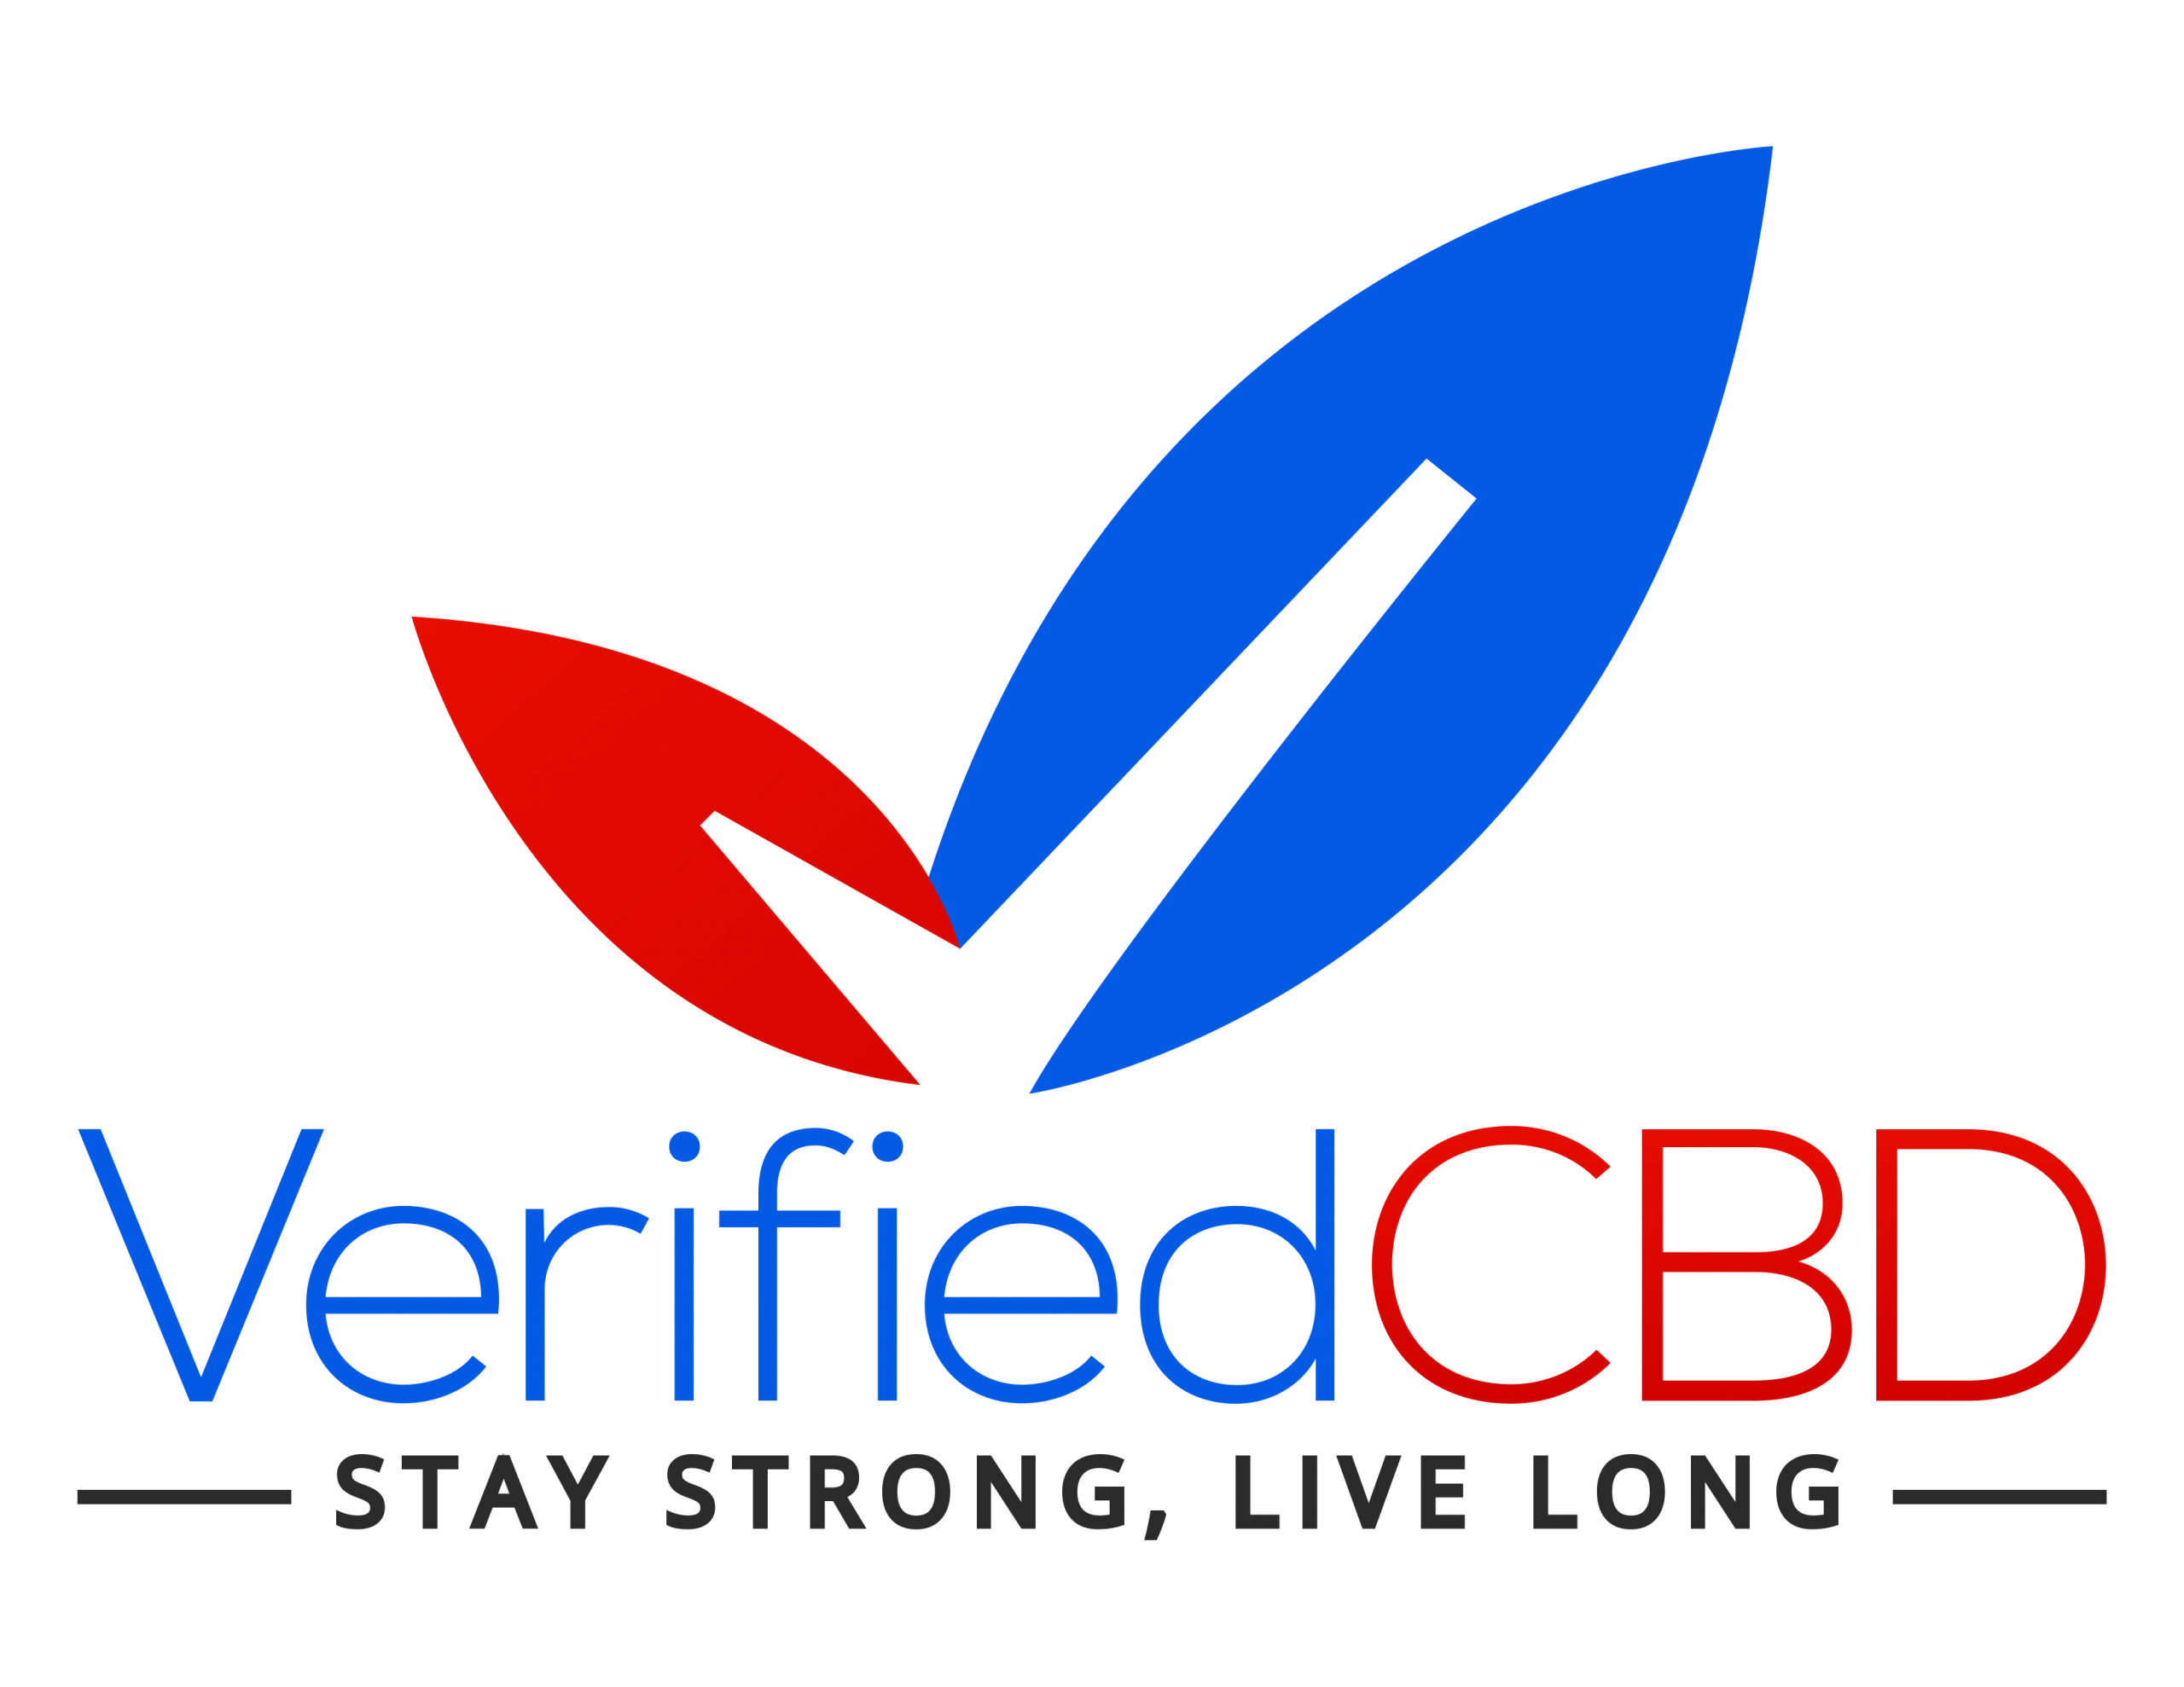 is verifiedCBD a good company?